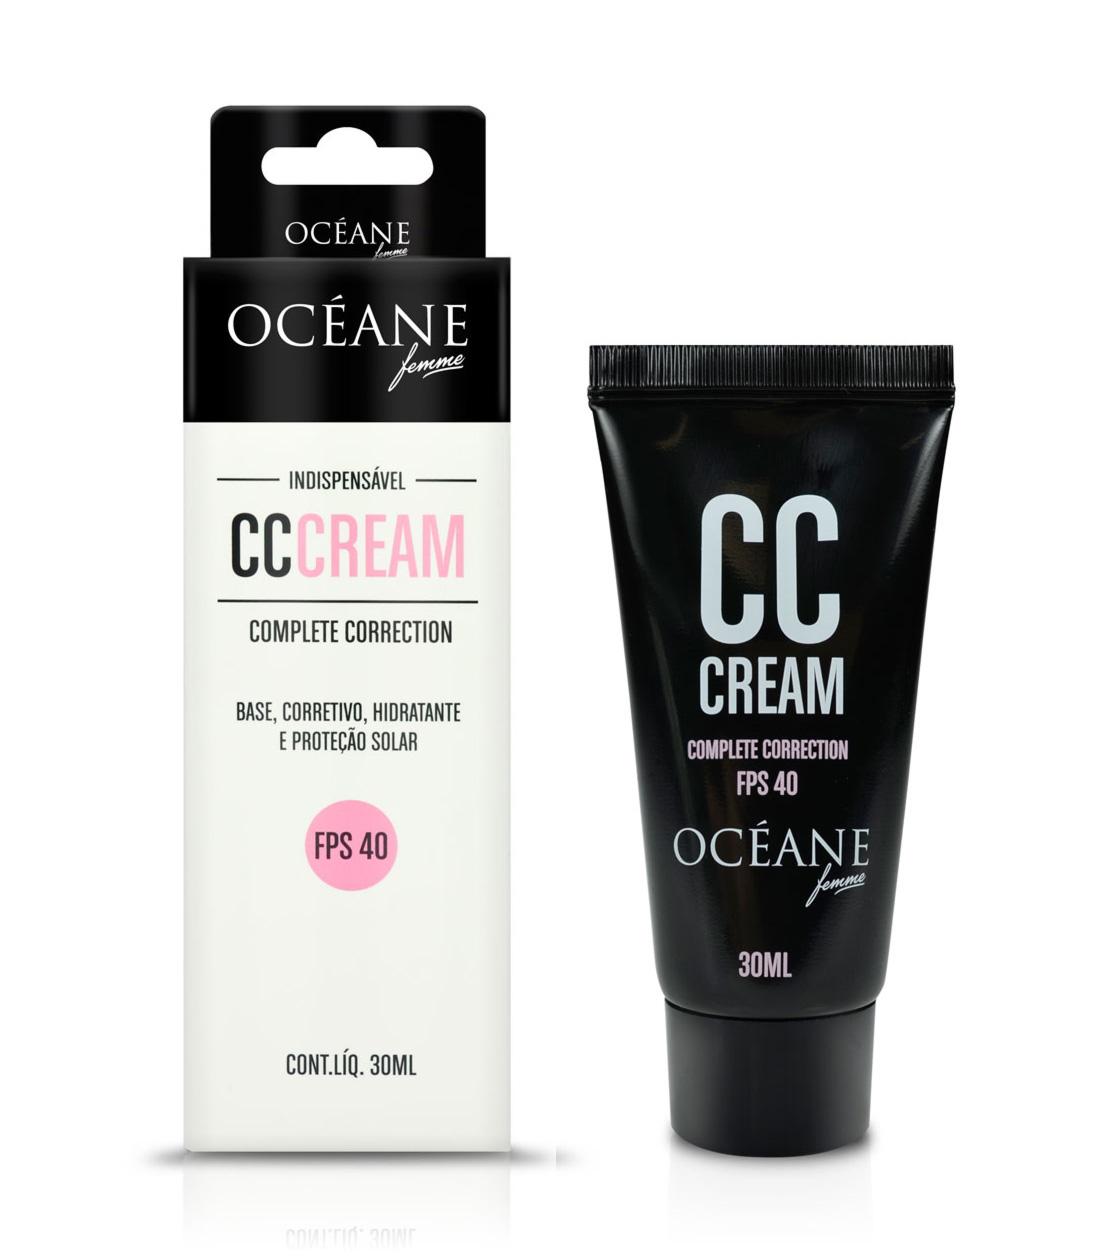 Océane-Femme-Base-CC-Cream-Océane-Femme-1216-2517151-1-zoom